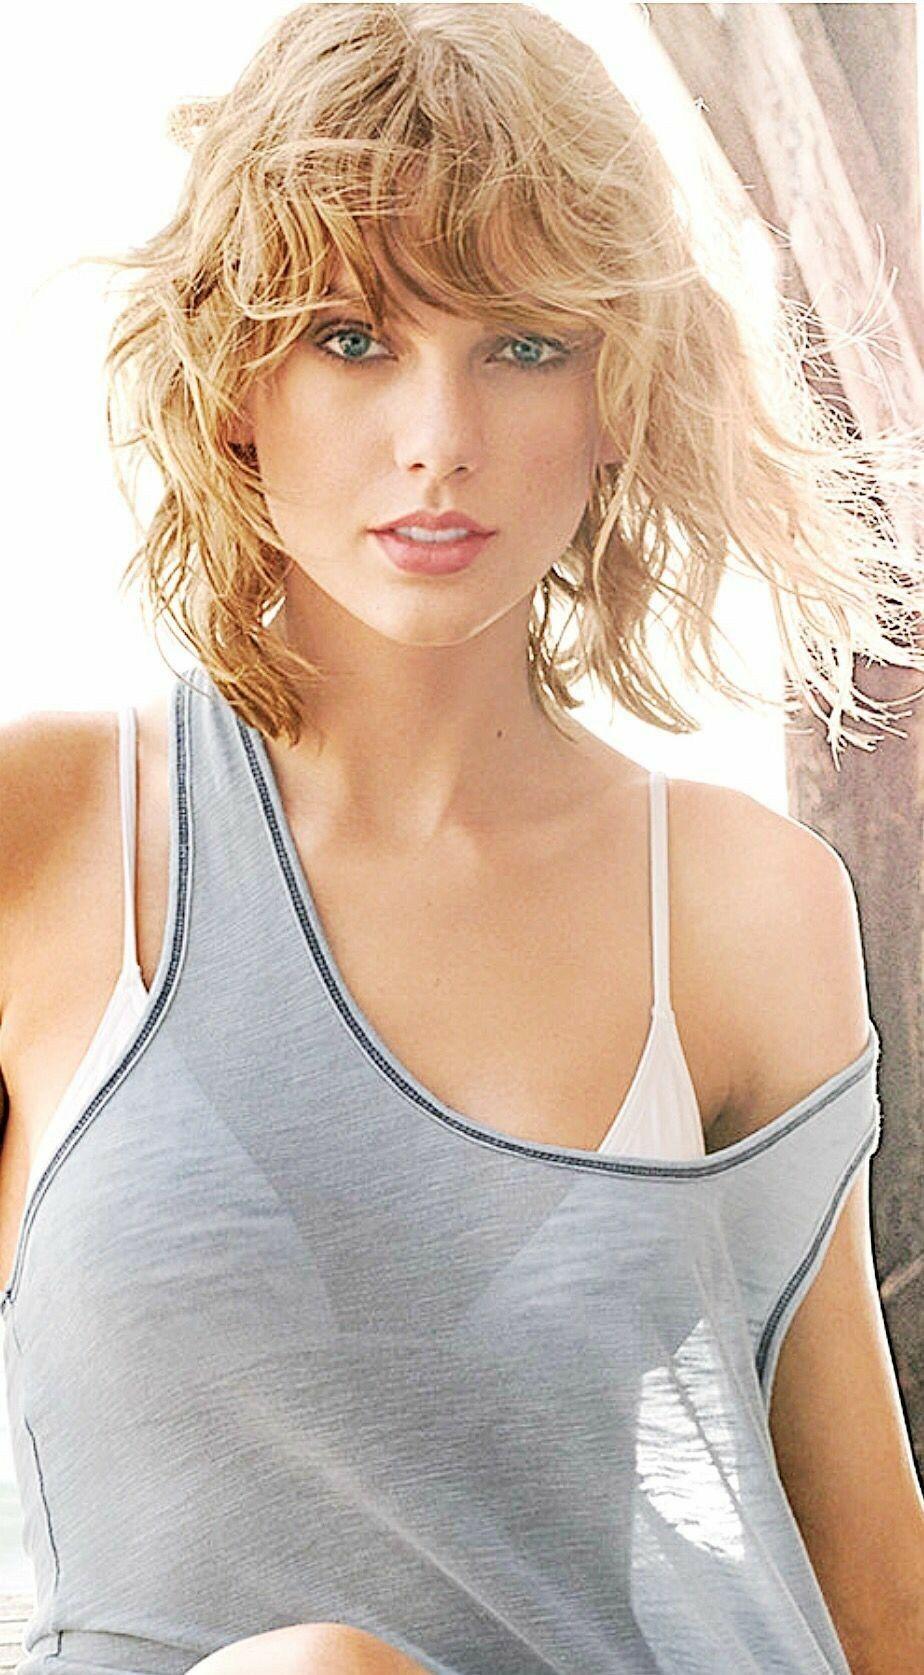 Pin by Jou on Celebs | Taylor swift hot, Taylor swift